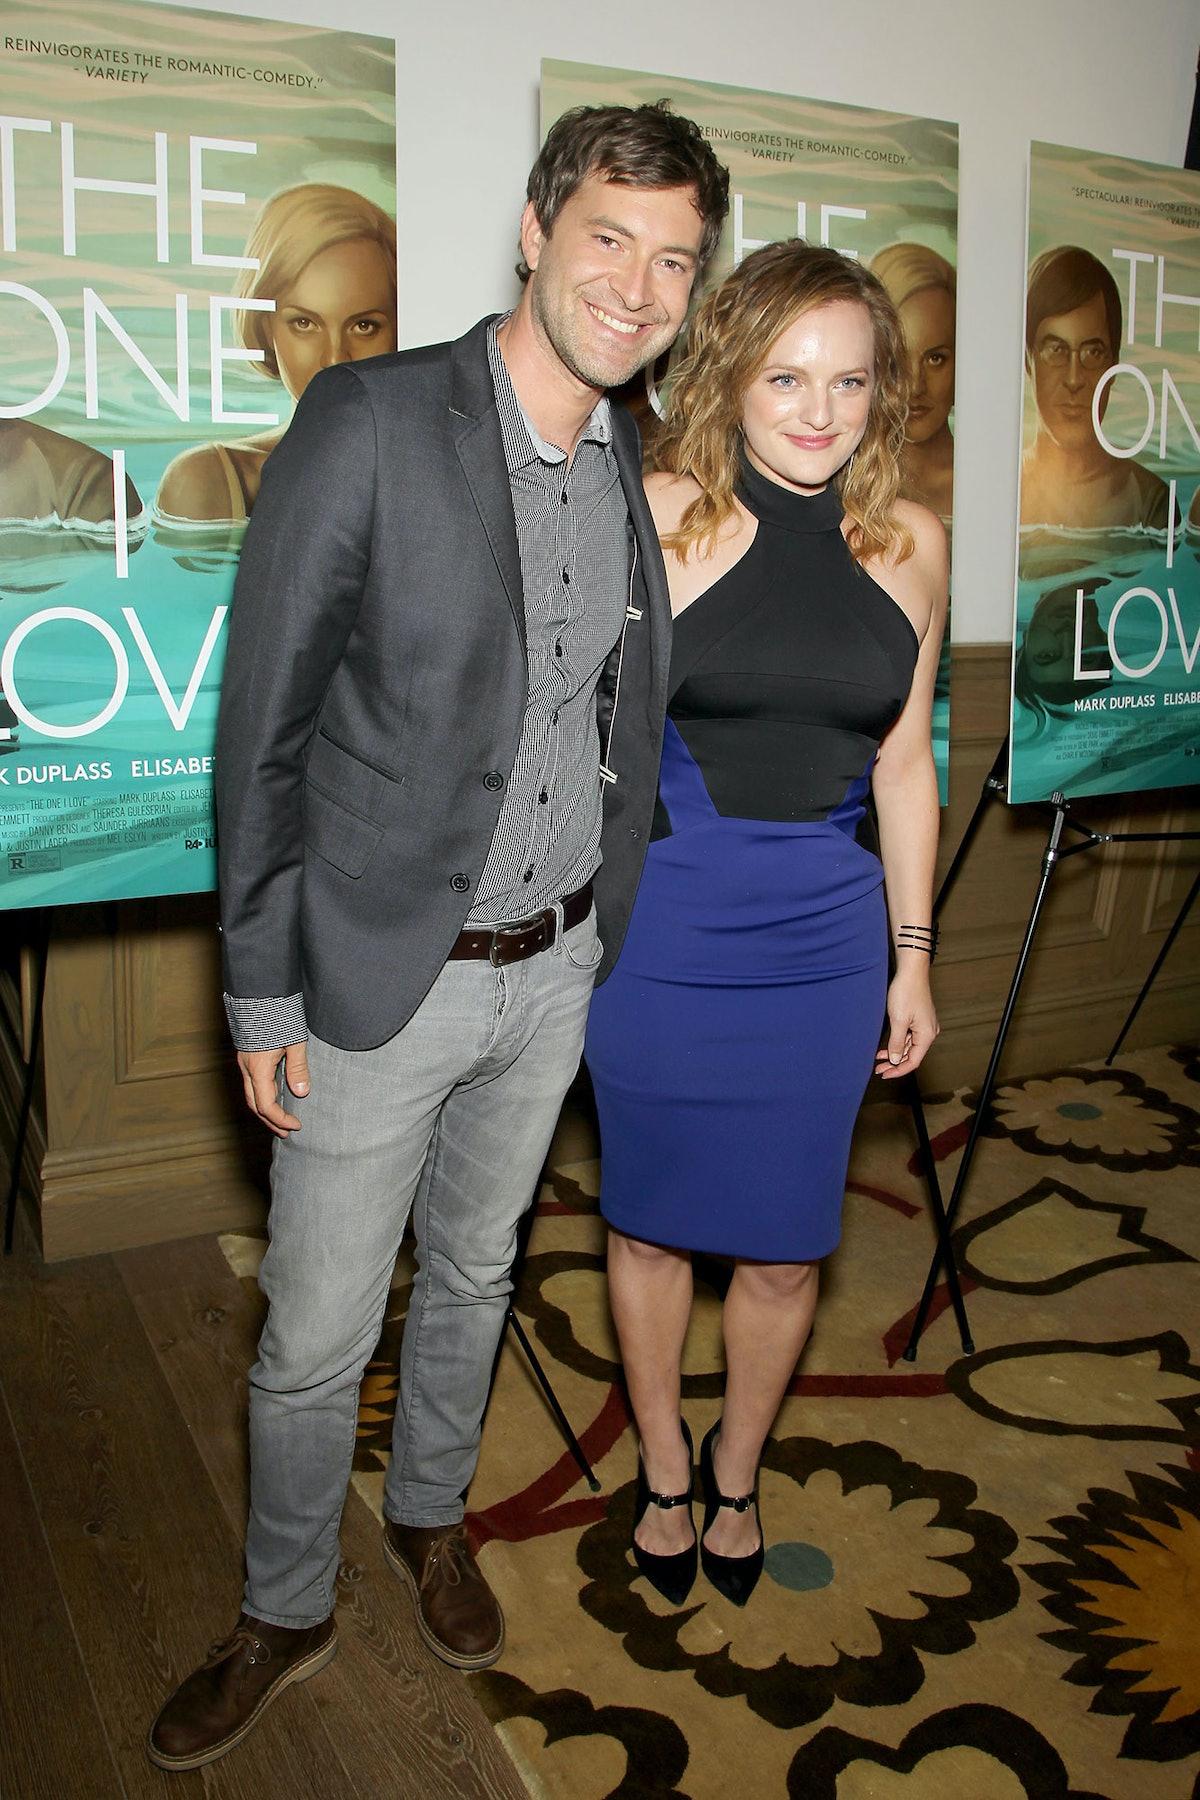 Mark Duplass and Elisabeth Moss